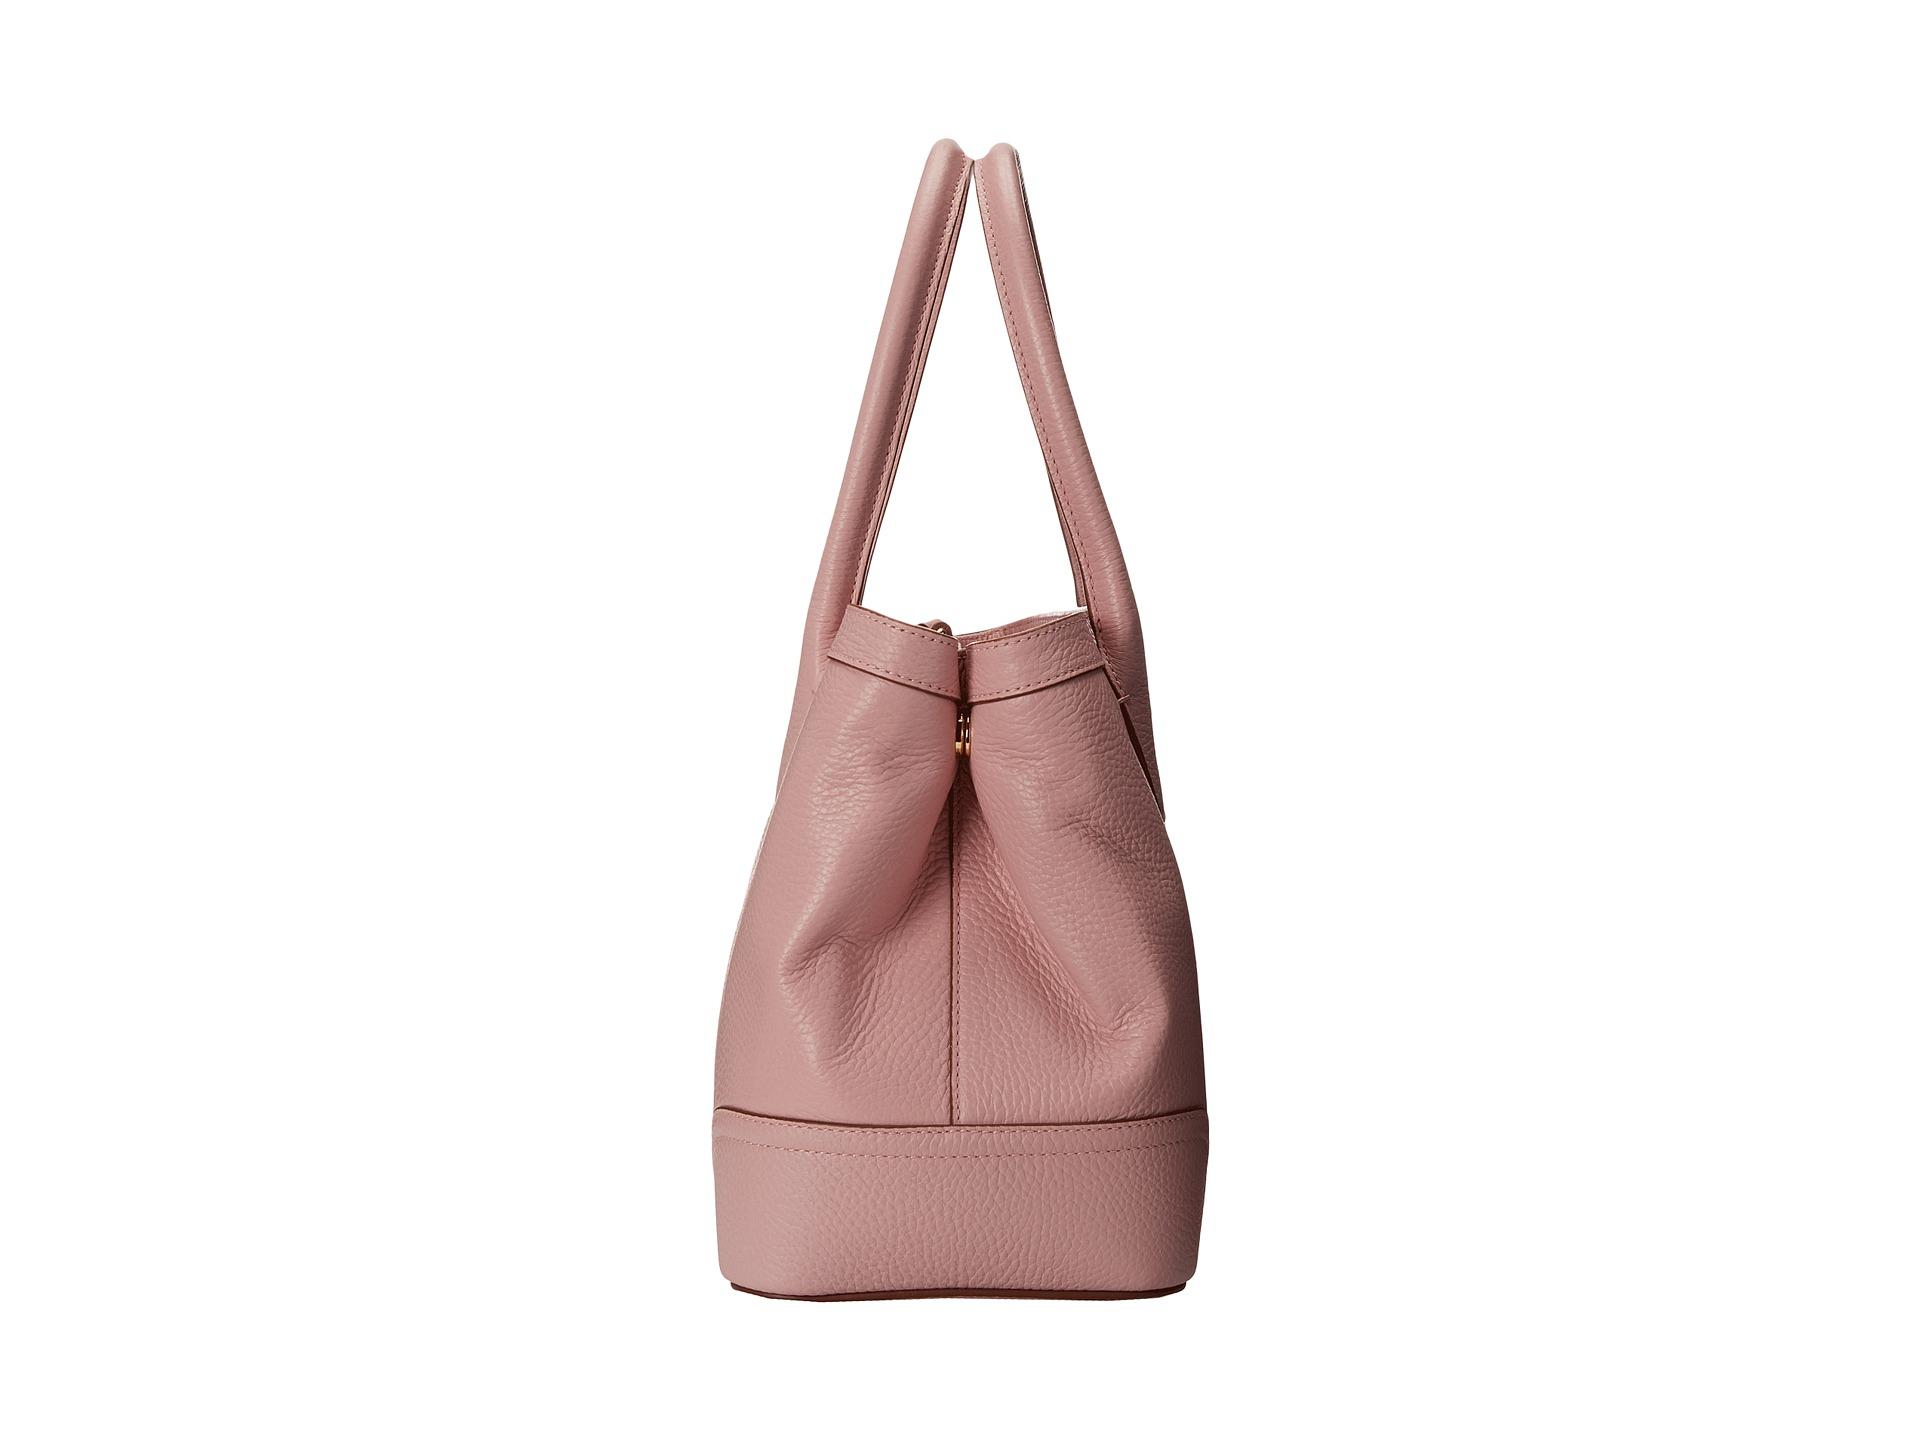 Lyst - Lauren by Ralph Lauren Fairfield City Shopper in Pink bea6062beddb2